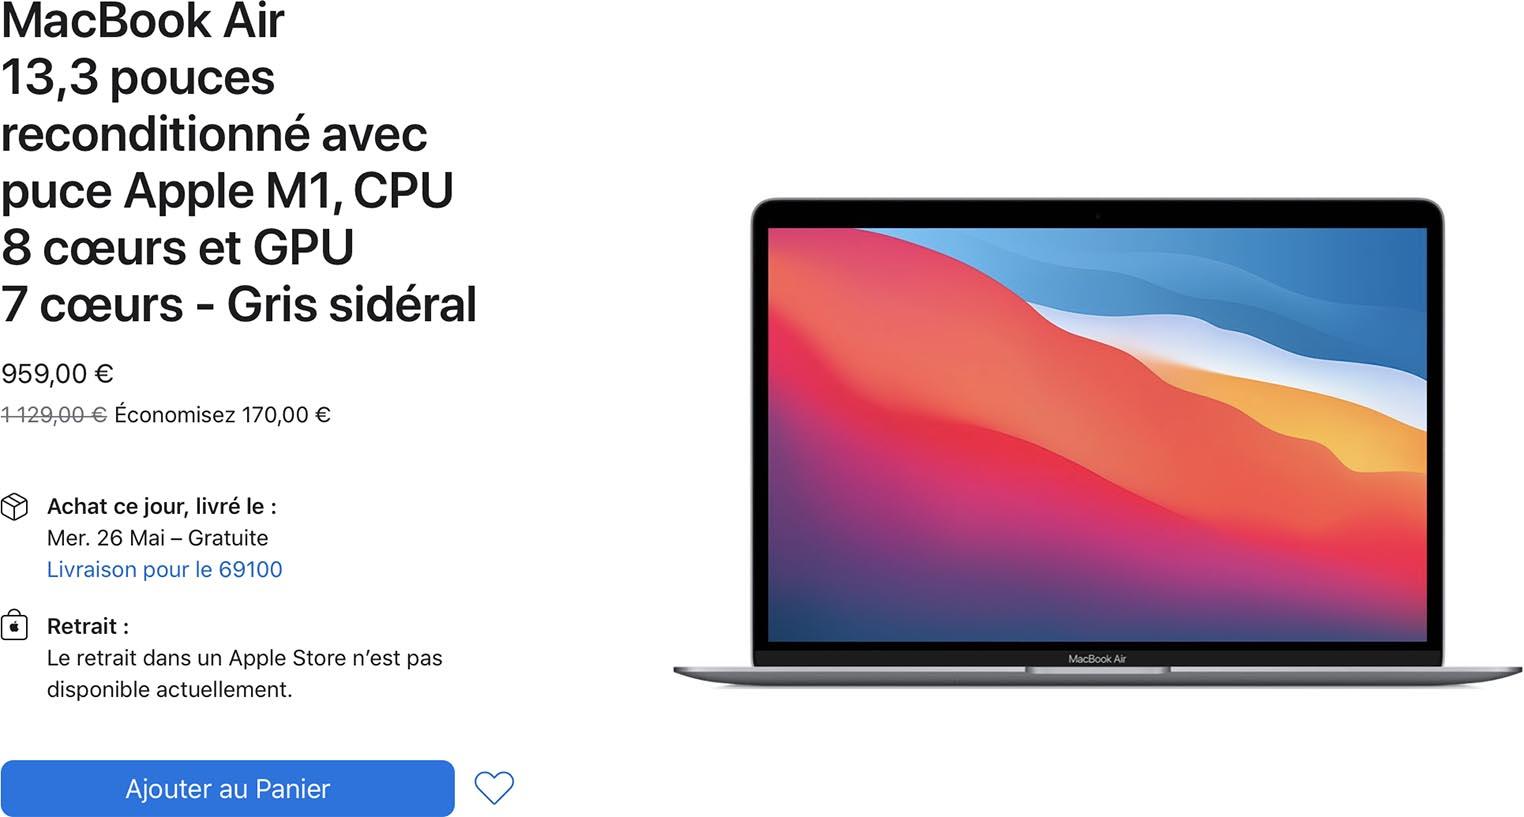 MacBook Air M1 Refurb